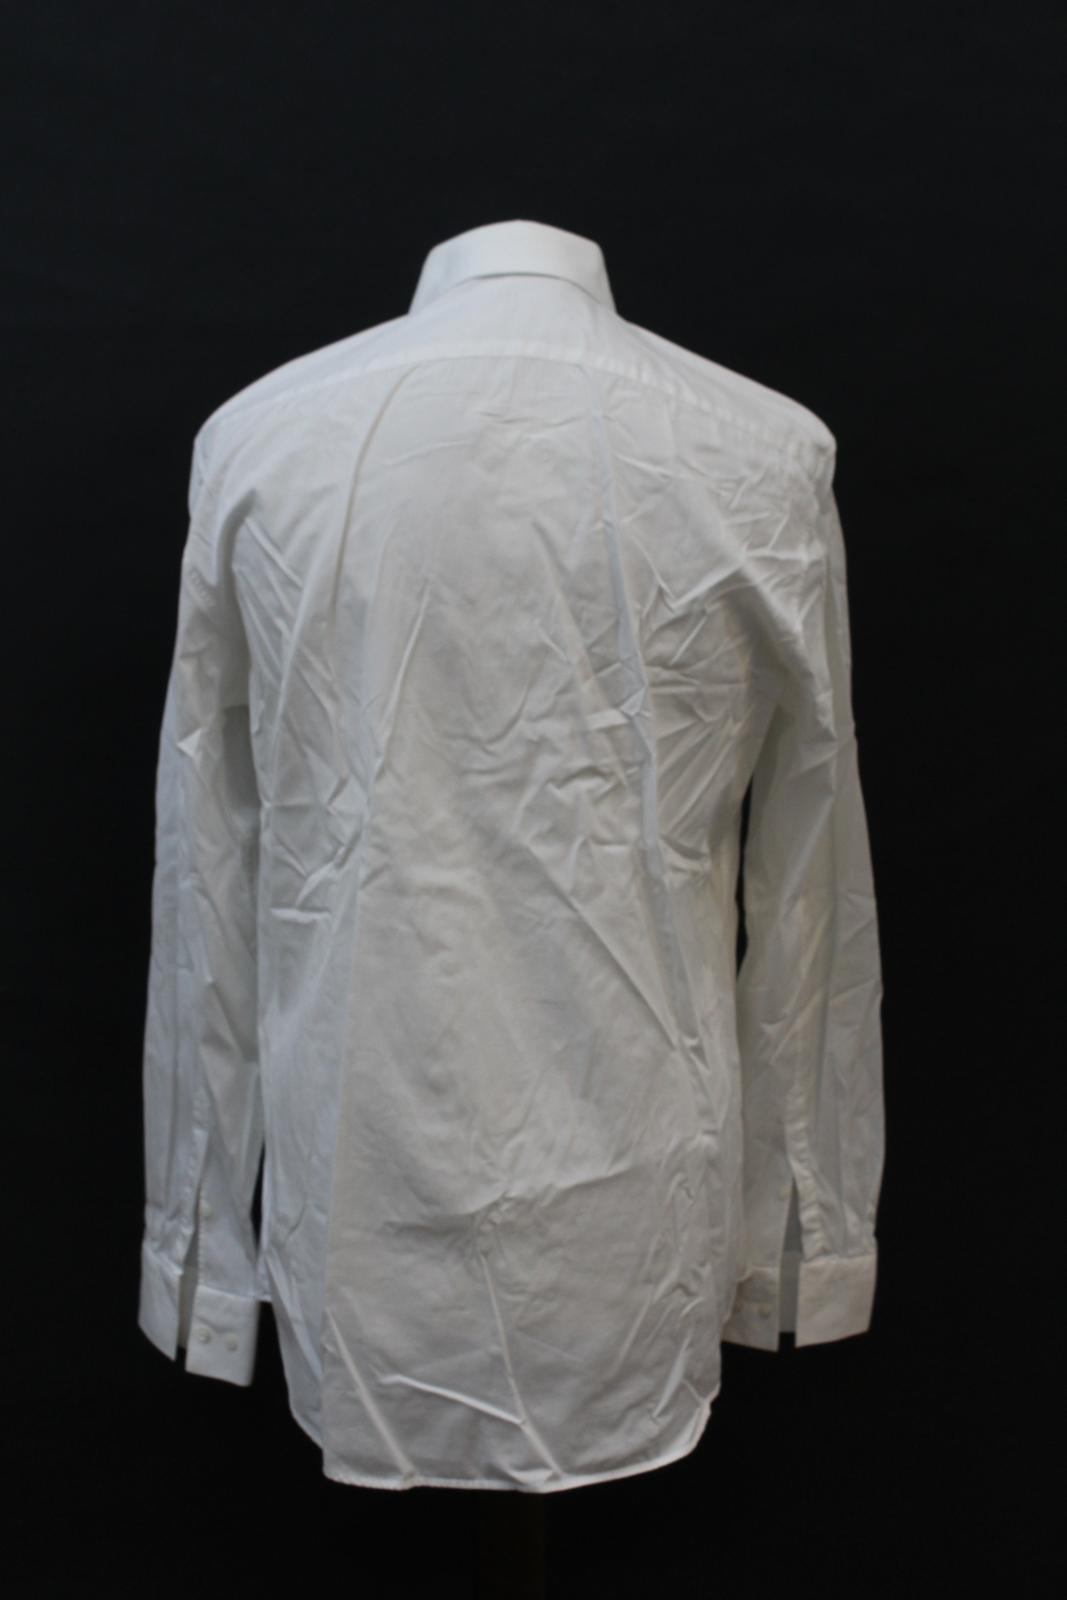 Neil-Barrett-para-hombre-calce-cenido-de-algodon-Blanco-Detalle-De-Cremallera-Botones-Camisa-Cuello miniatura 5